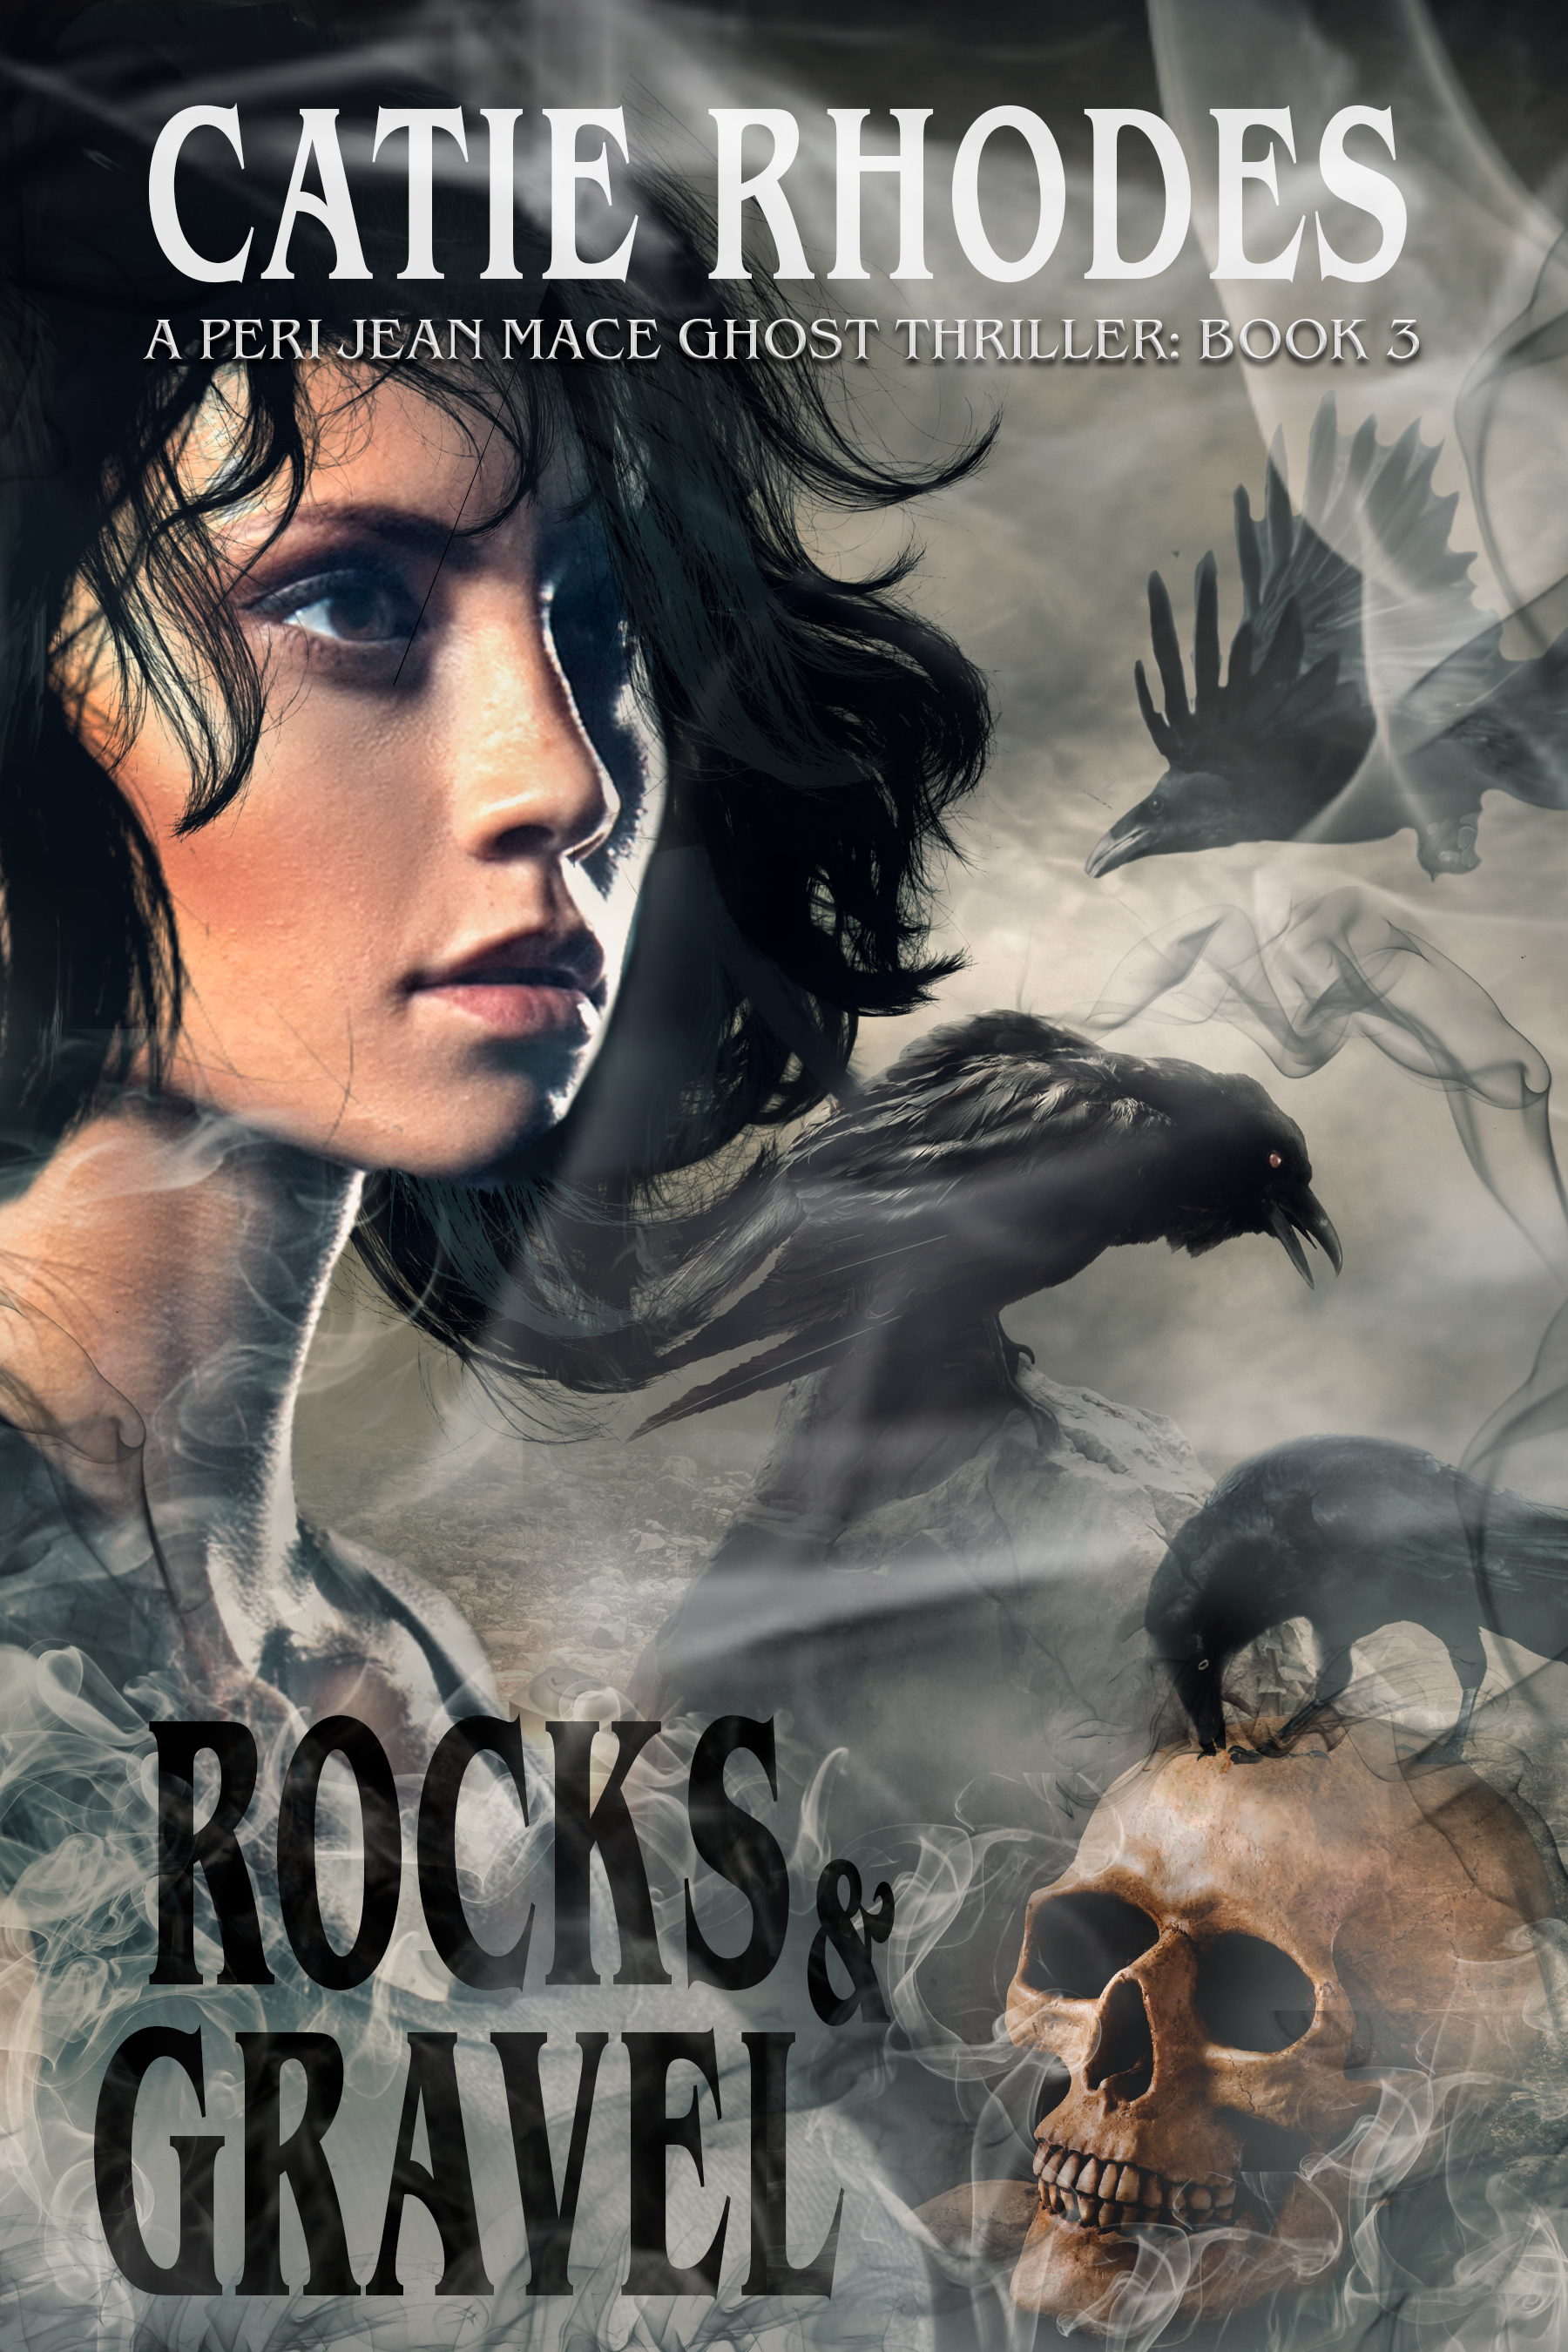 RocksAndGravel